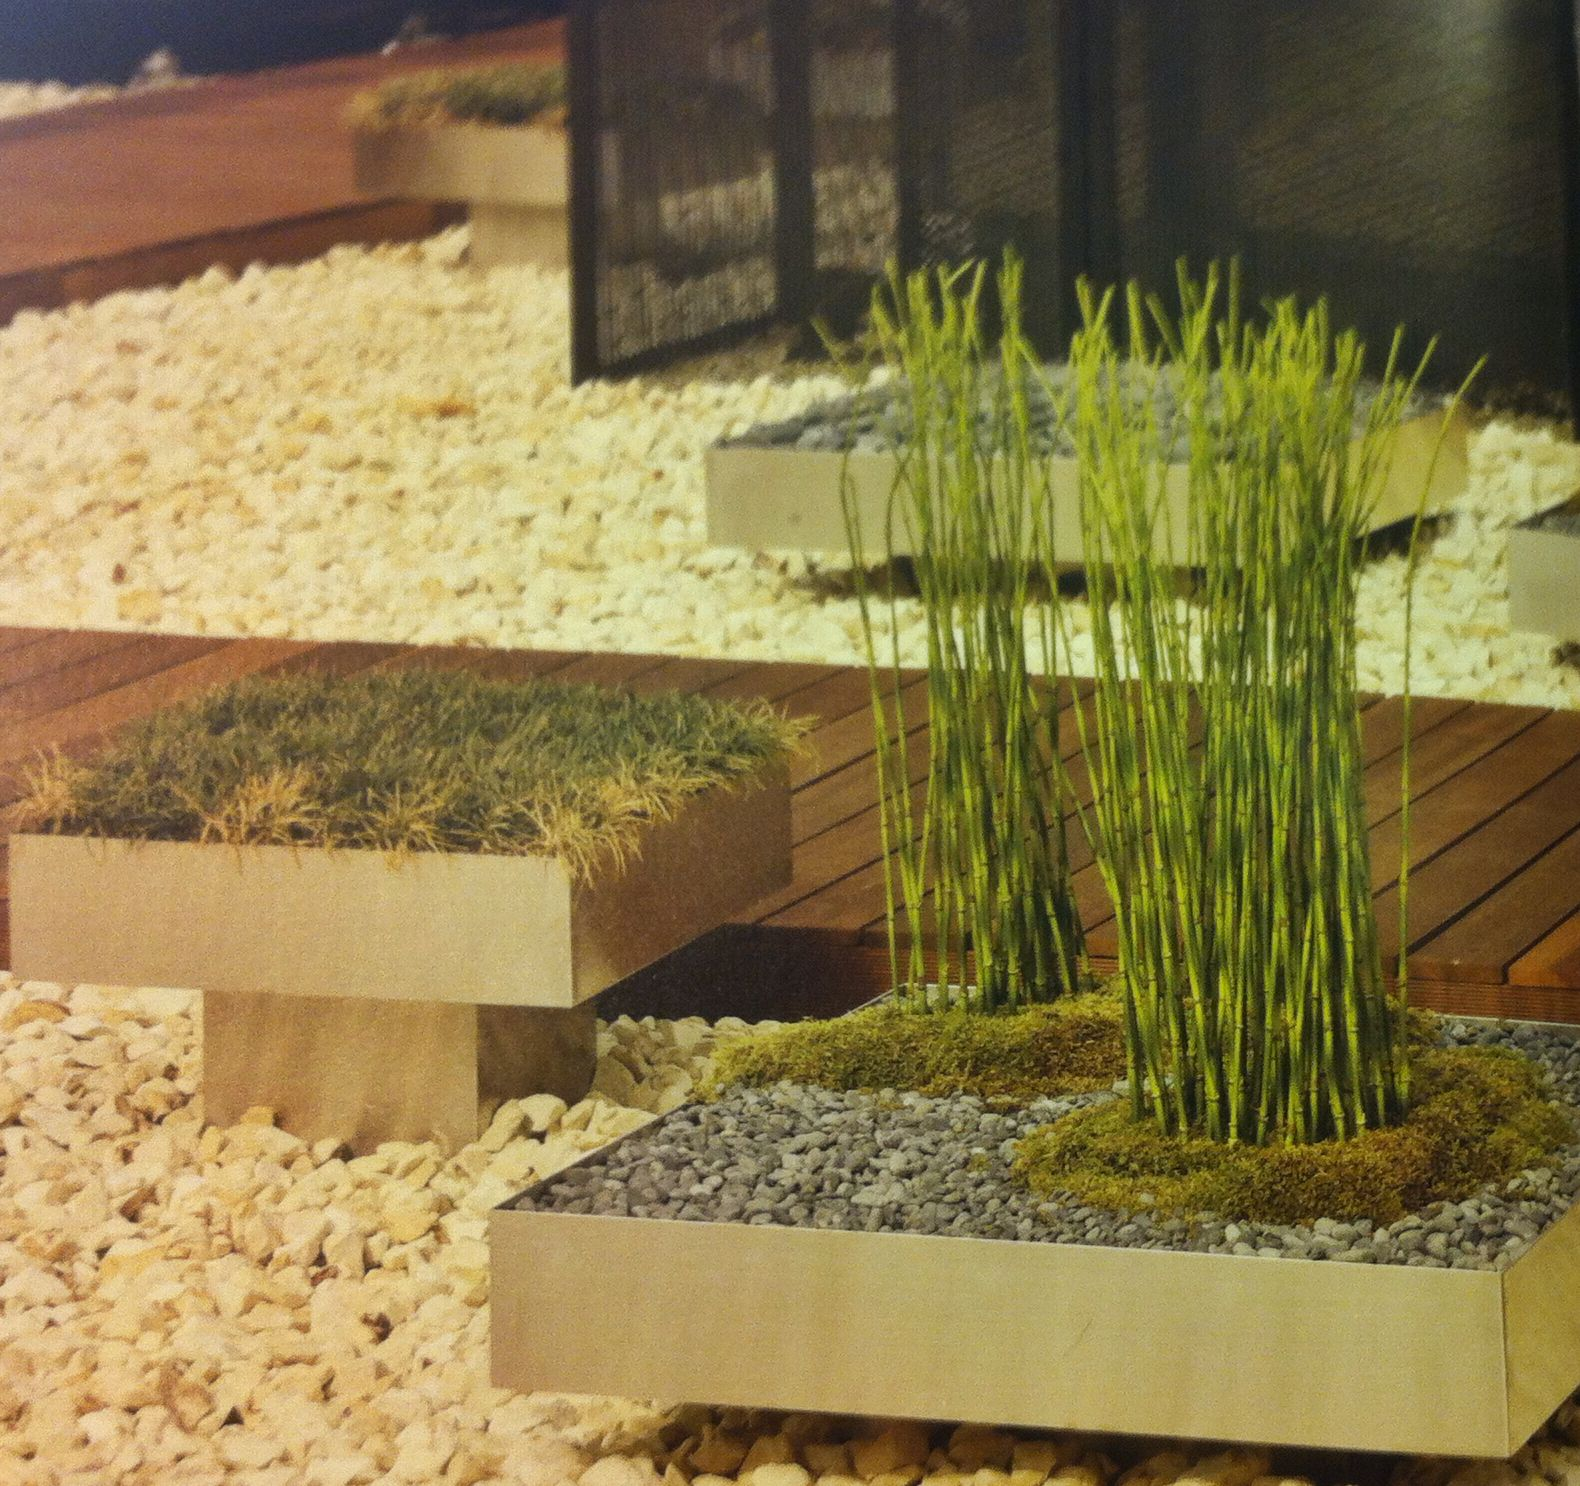 Jardinera Japonesa Jardinera Movil Poco Profunda Con Vegetacion Acero Inox Pulido